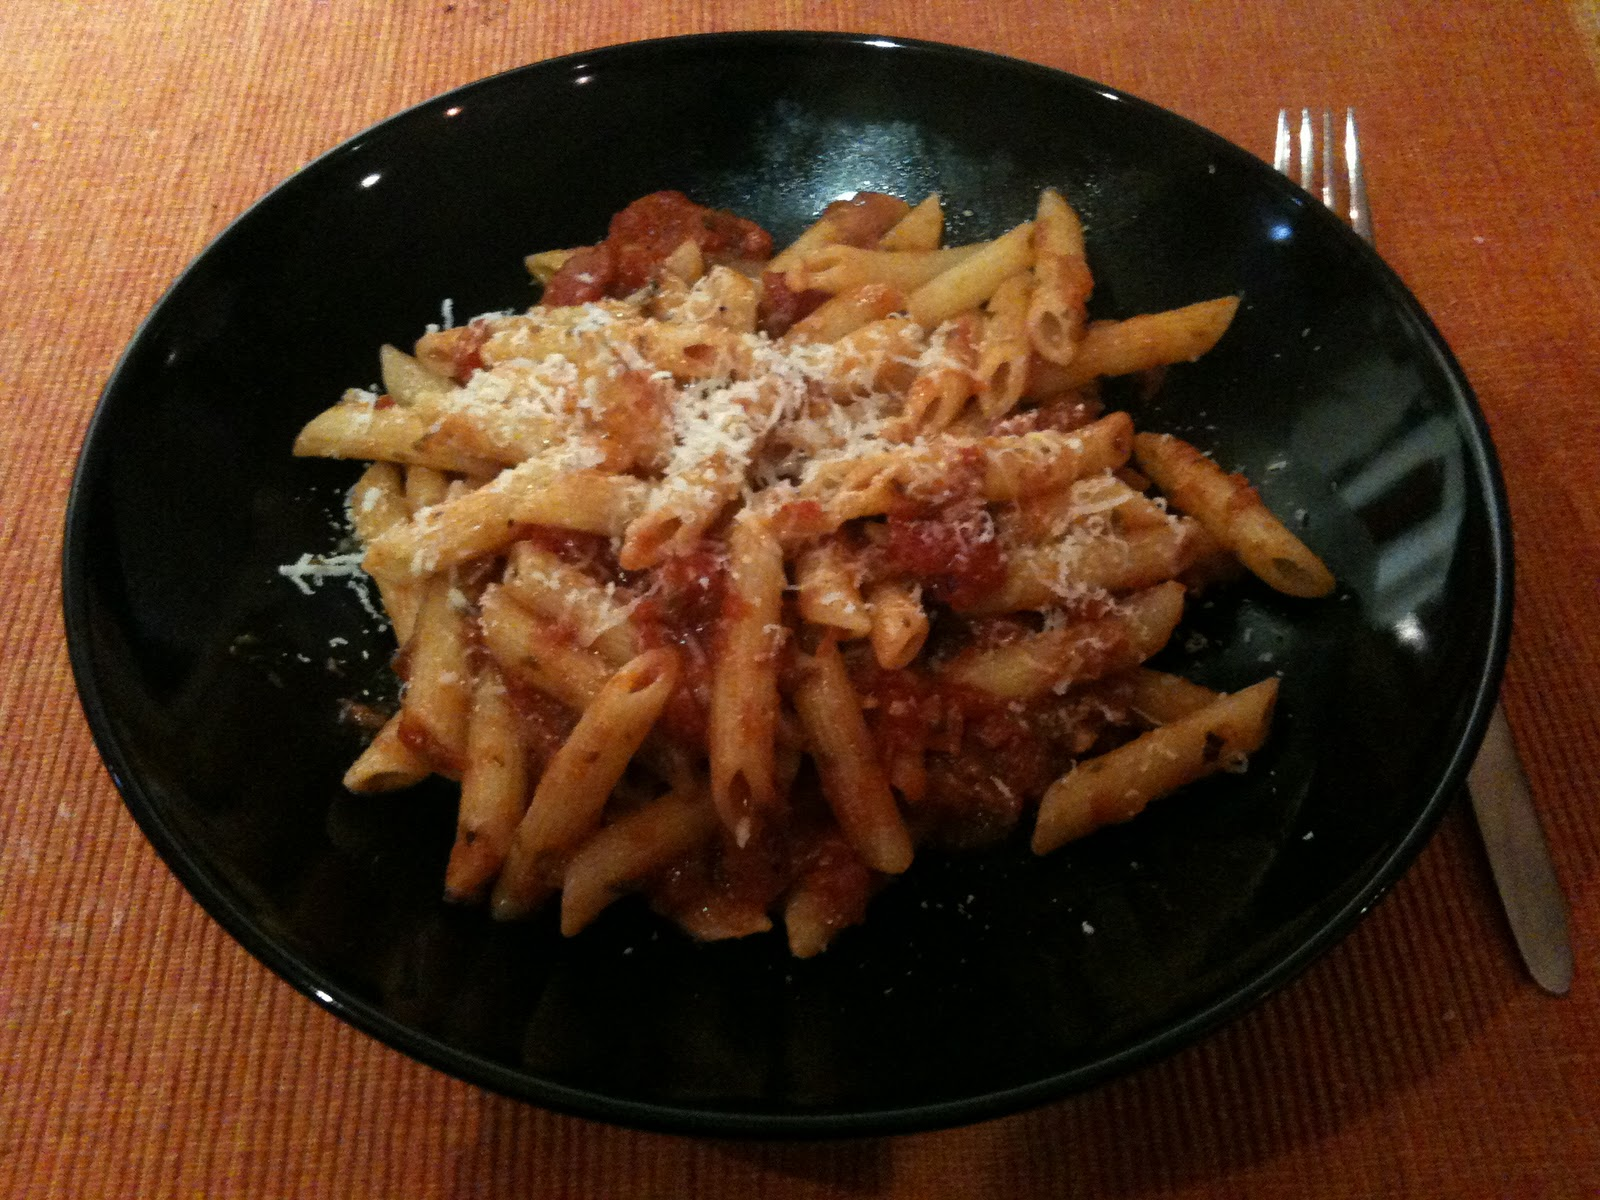 365 rezepte every day a new meal 21 februar 2011 penne mit tomatensauce mit sardellen. Black Bedroom Furniture Sets. Home Design Ideas